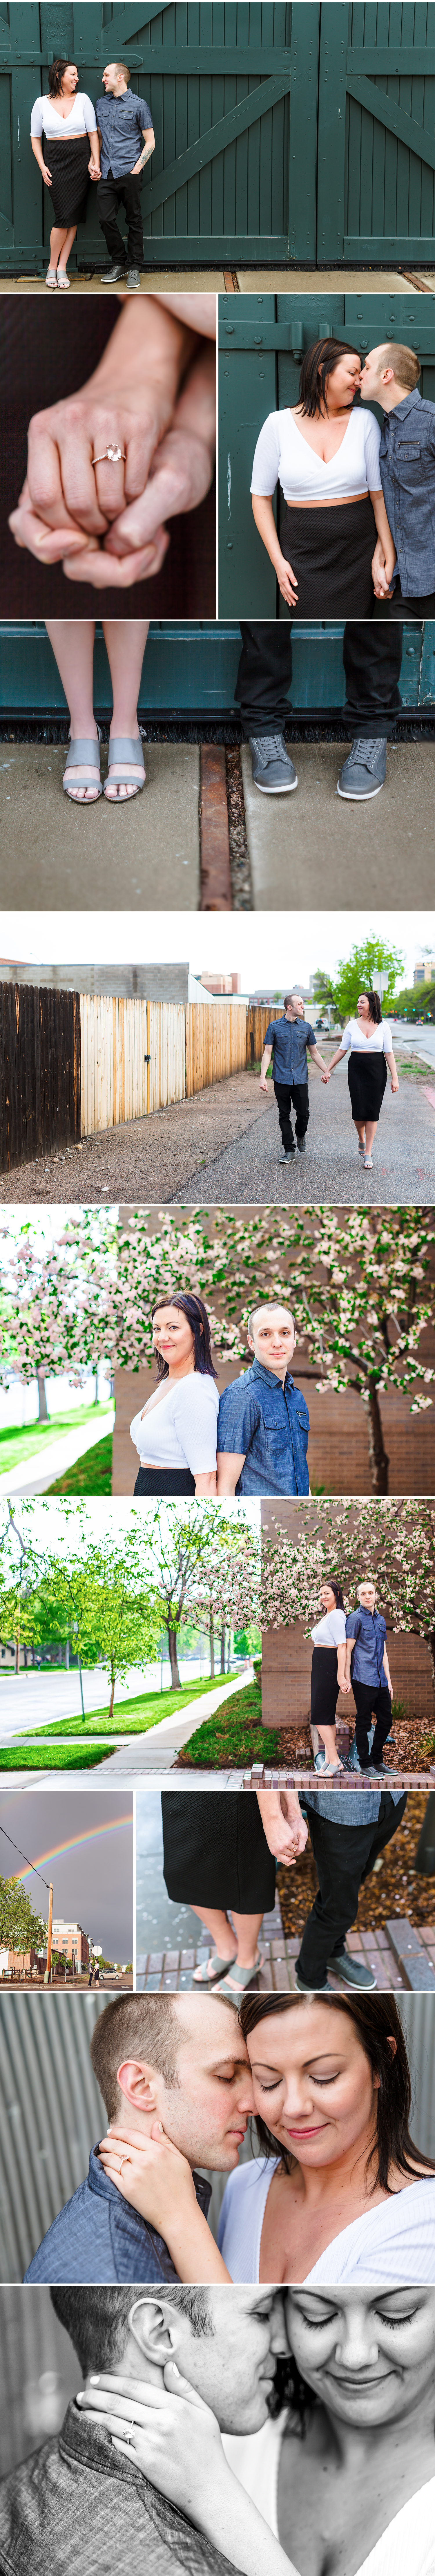 1_Fort Collins Engagement Photographer.jpg